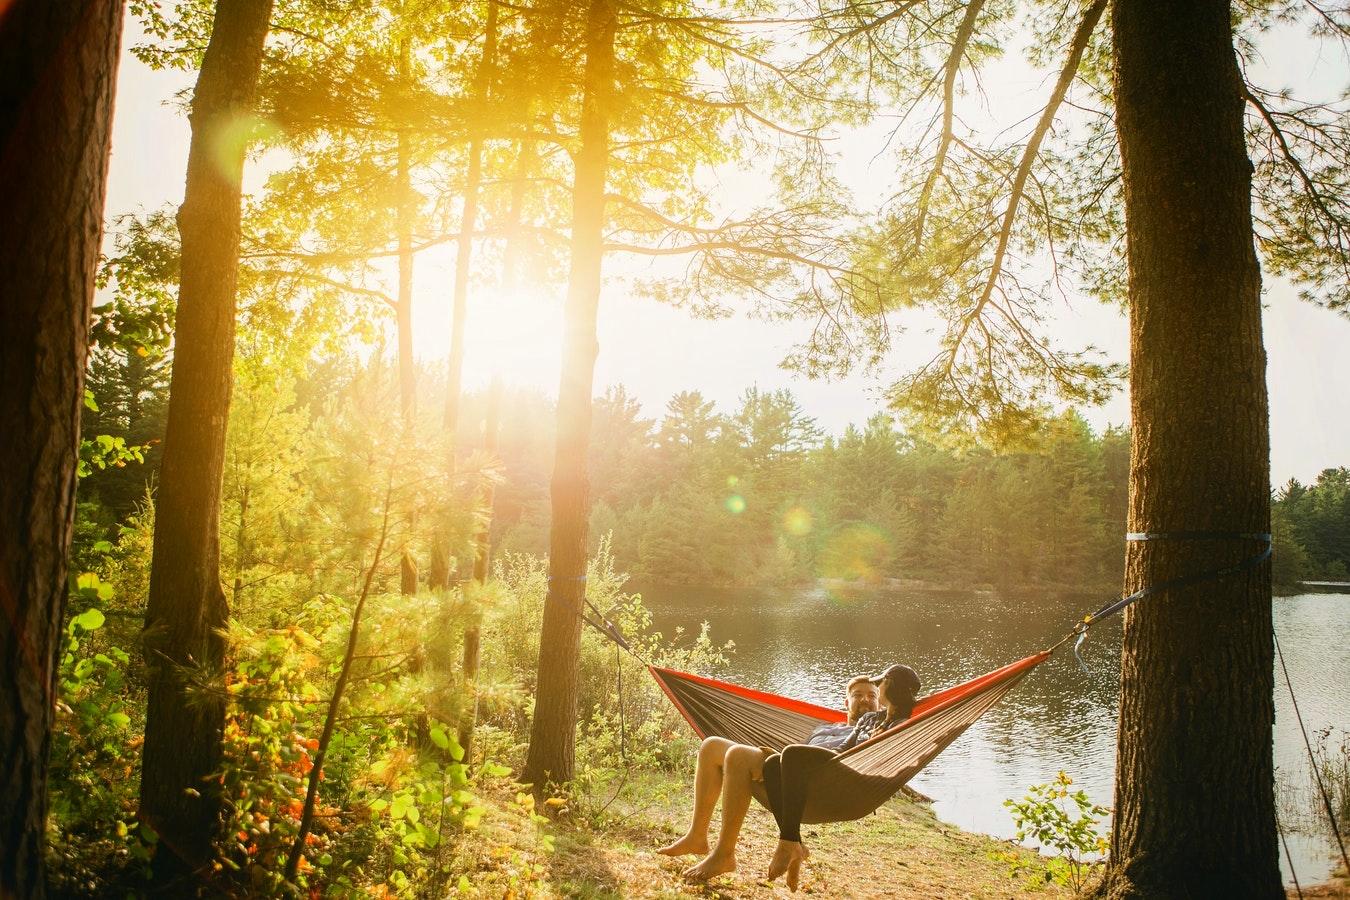 Camping Near Lake George